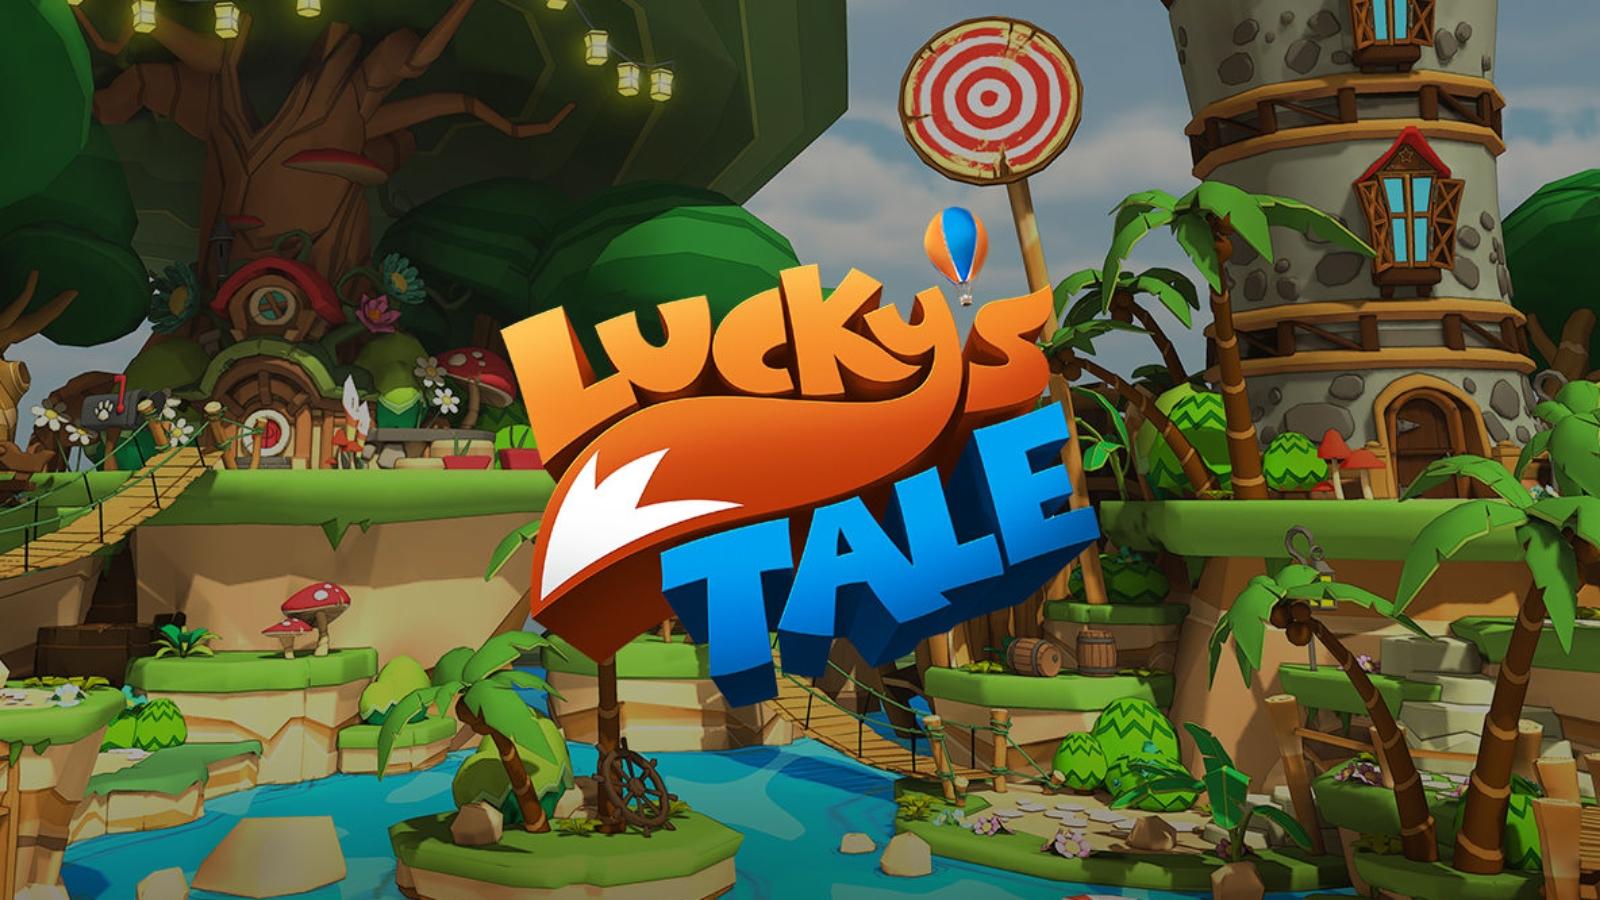 luckys tale